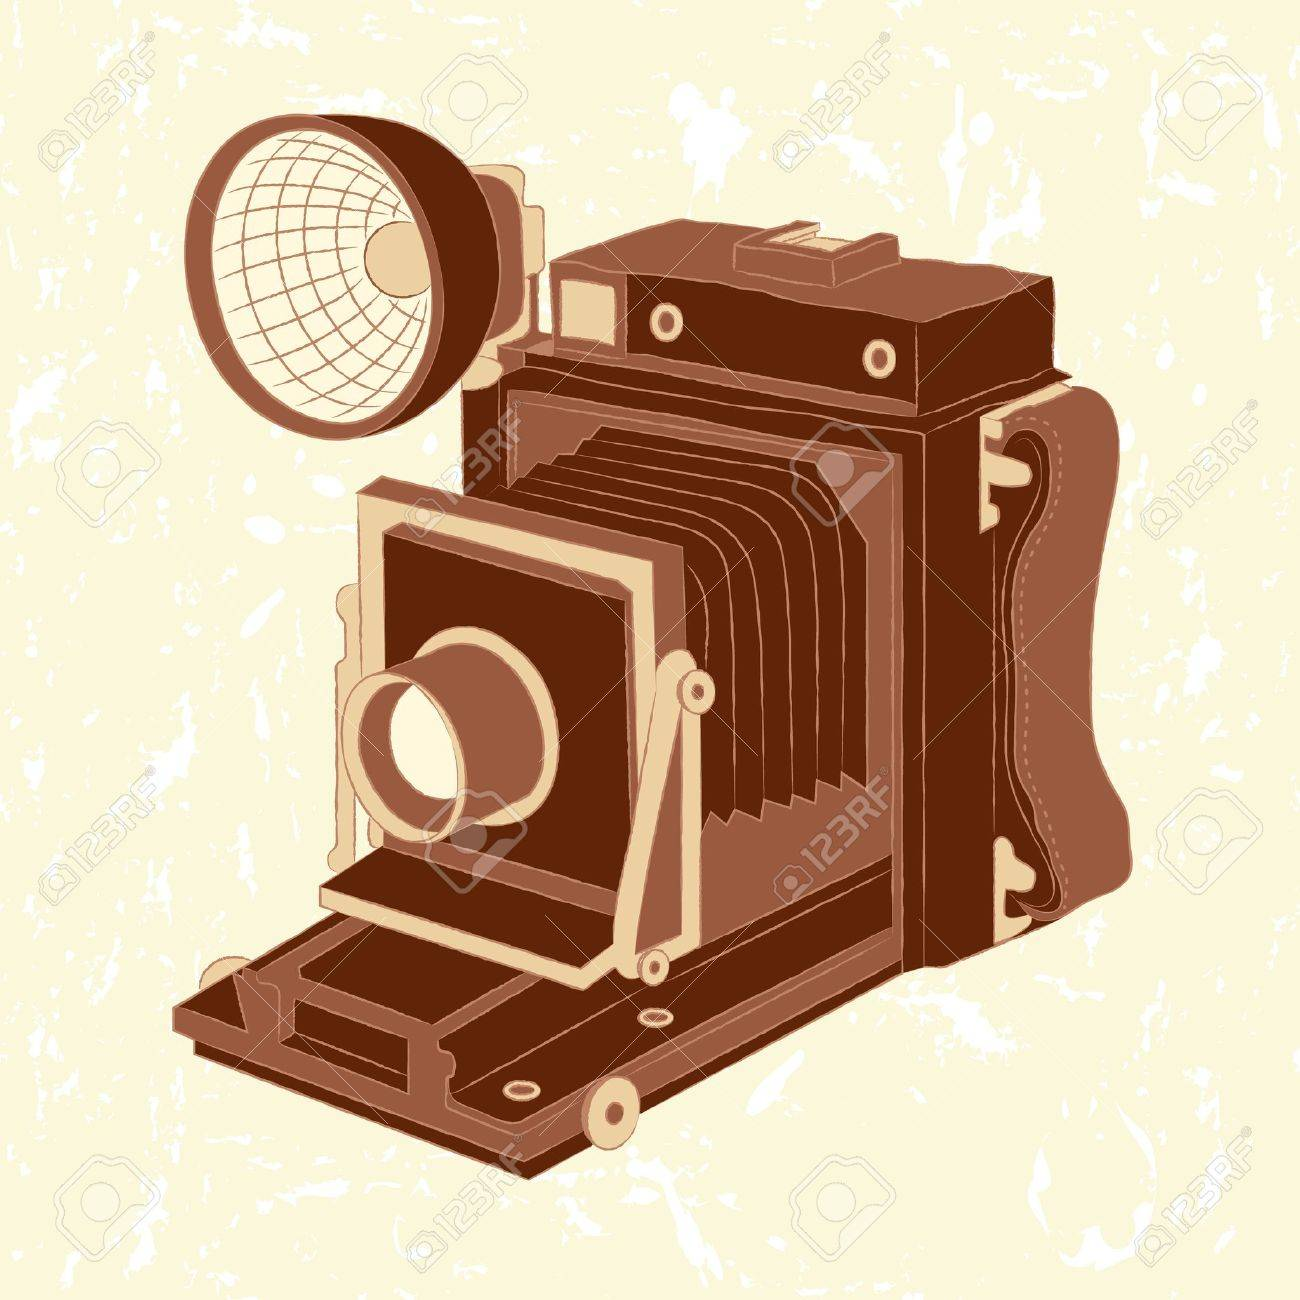 Vector illustration of vintage photo camera on grunge background Stock Vector - 14100533